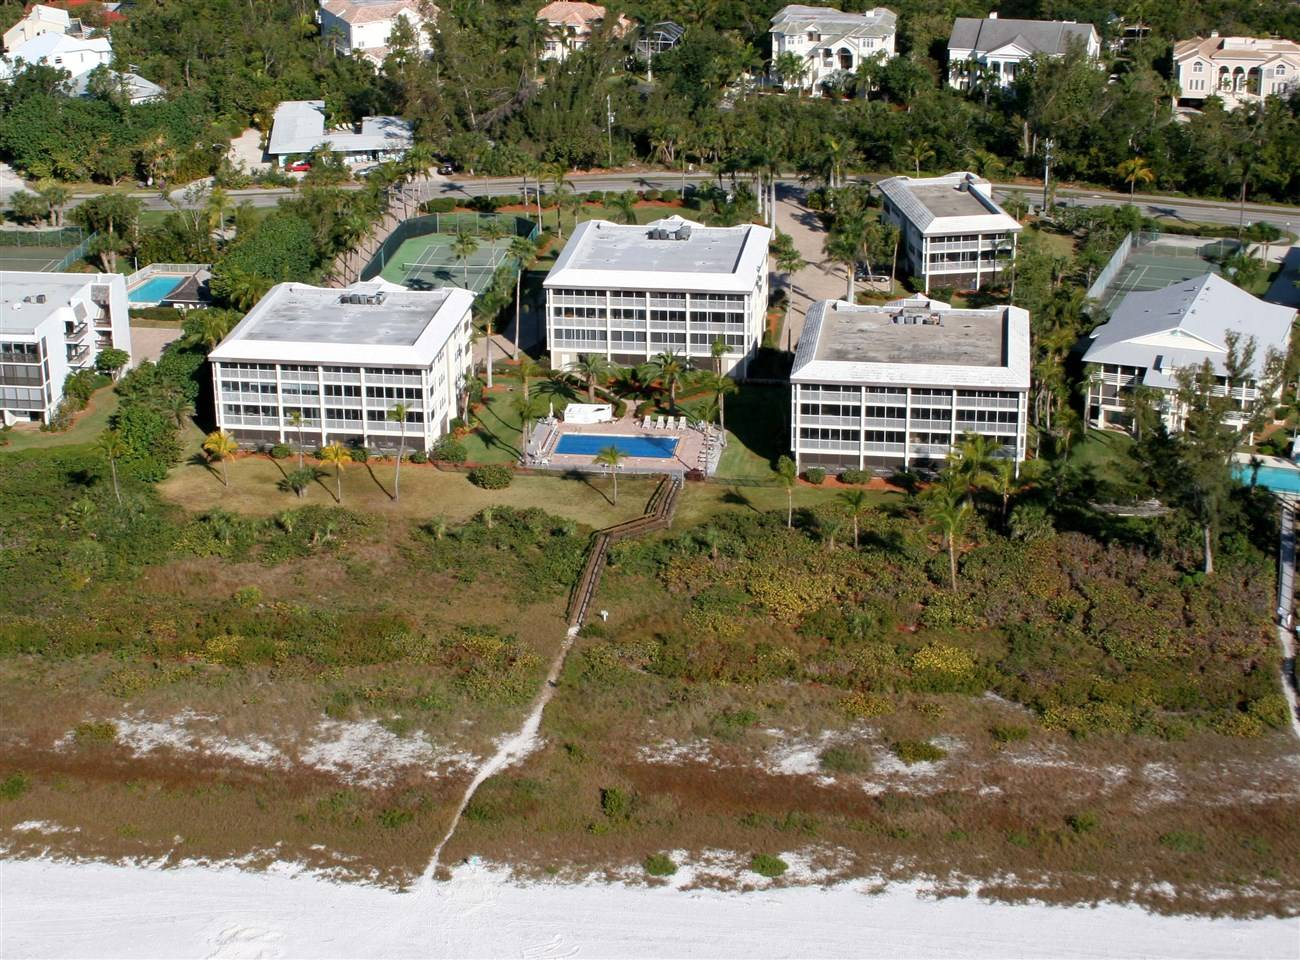 Beachcomber Vacation Condo Rentals Sanibel Island Florida Rentals